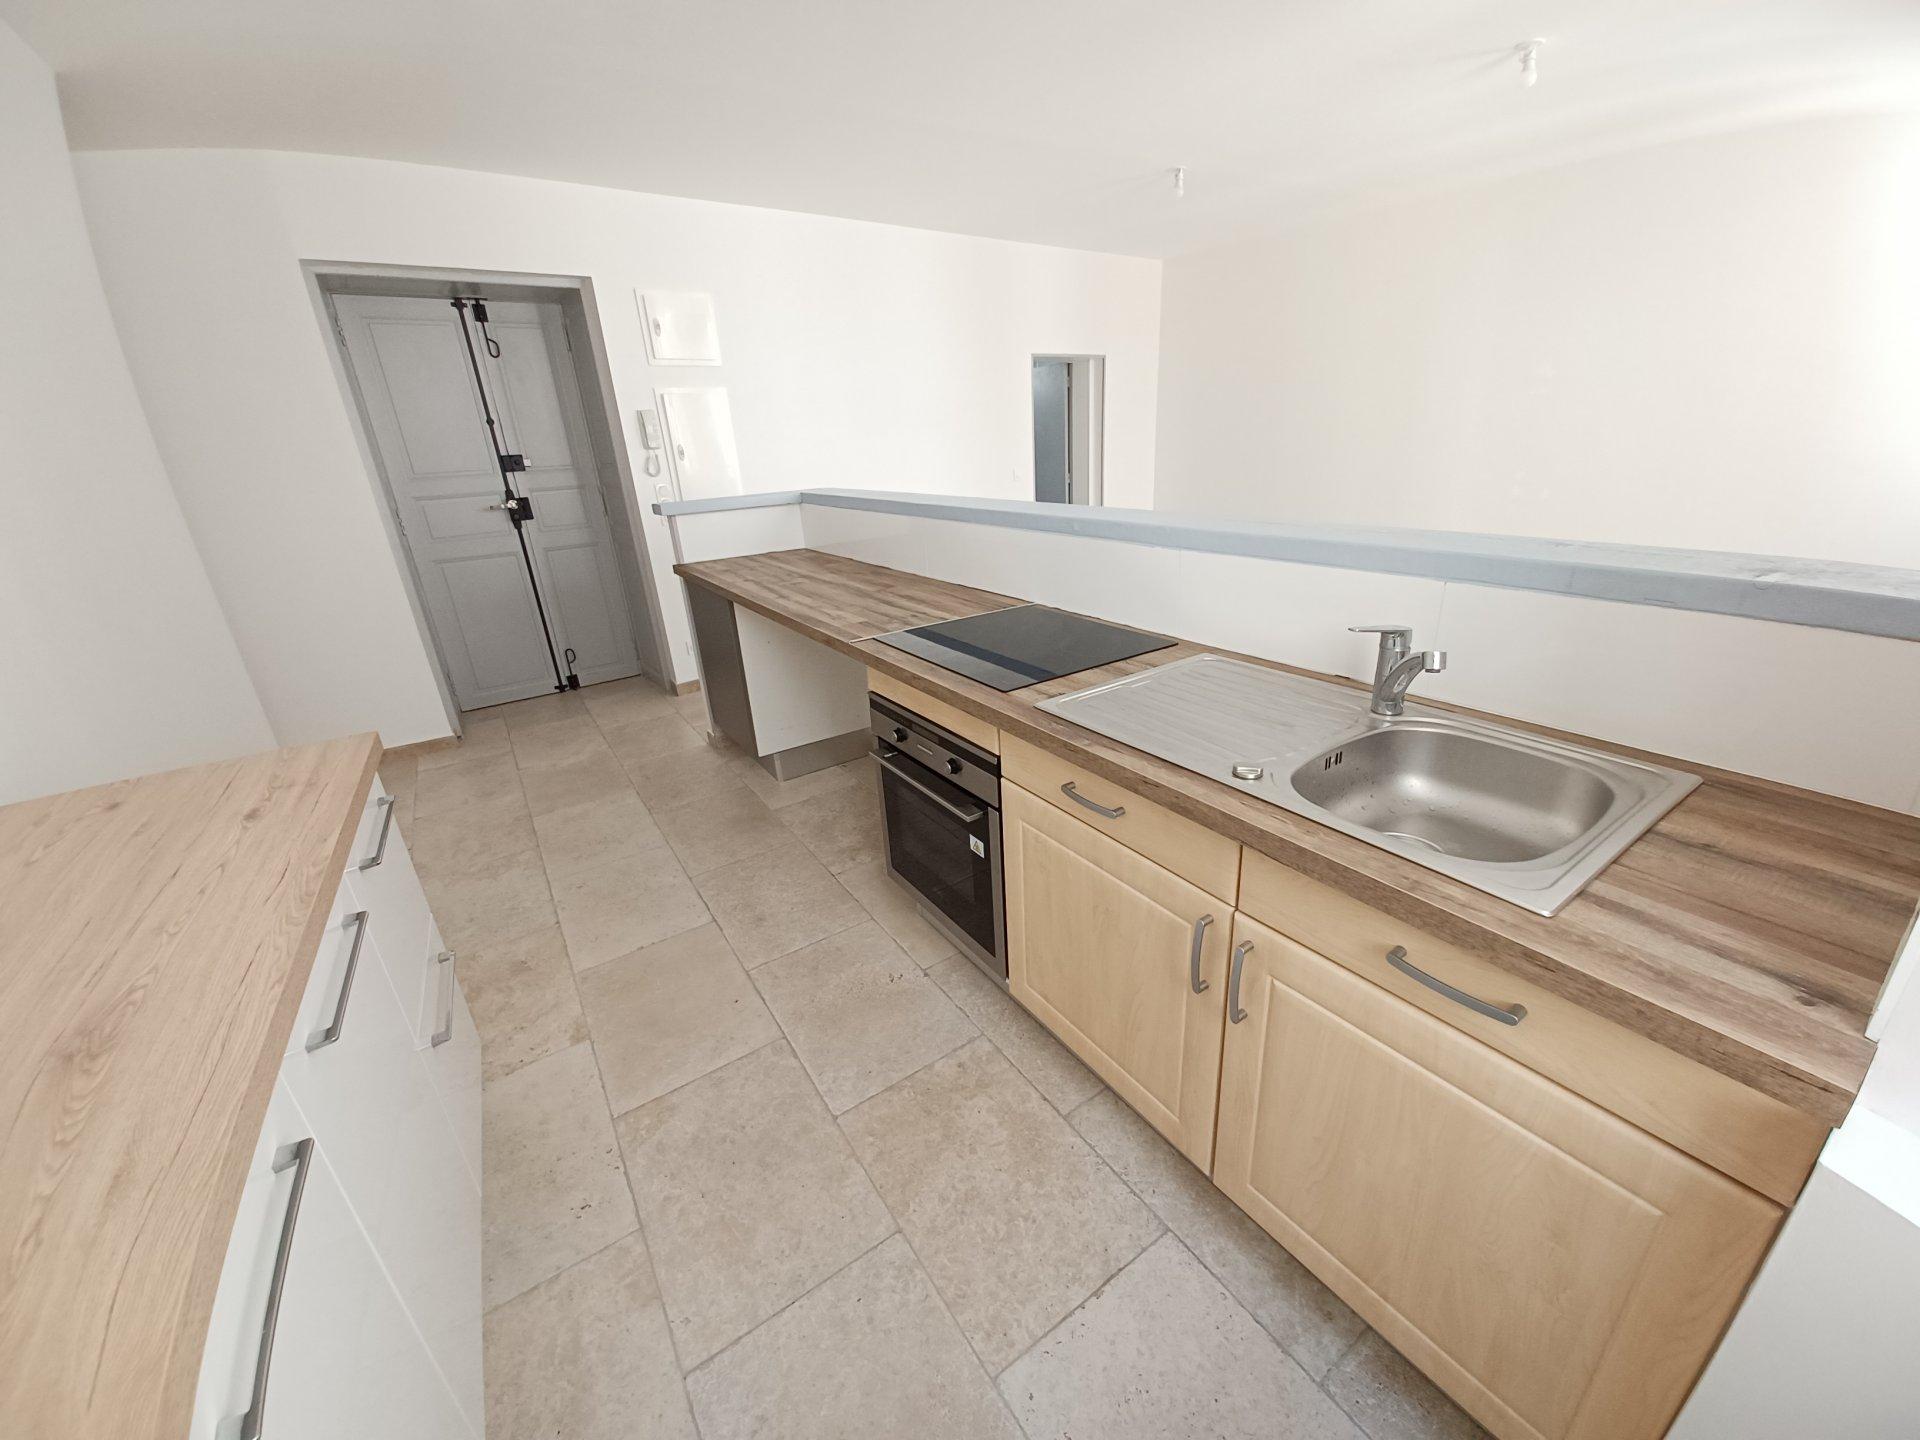 Location Appartement TARASCON surface habitable de 56 m²